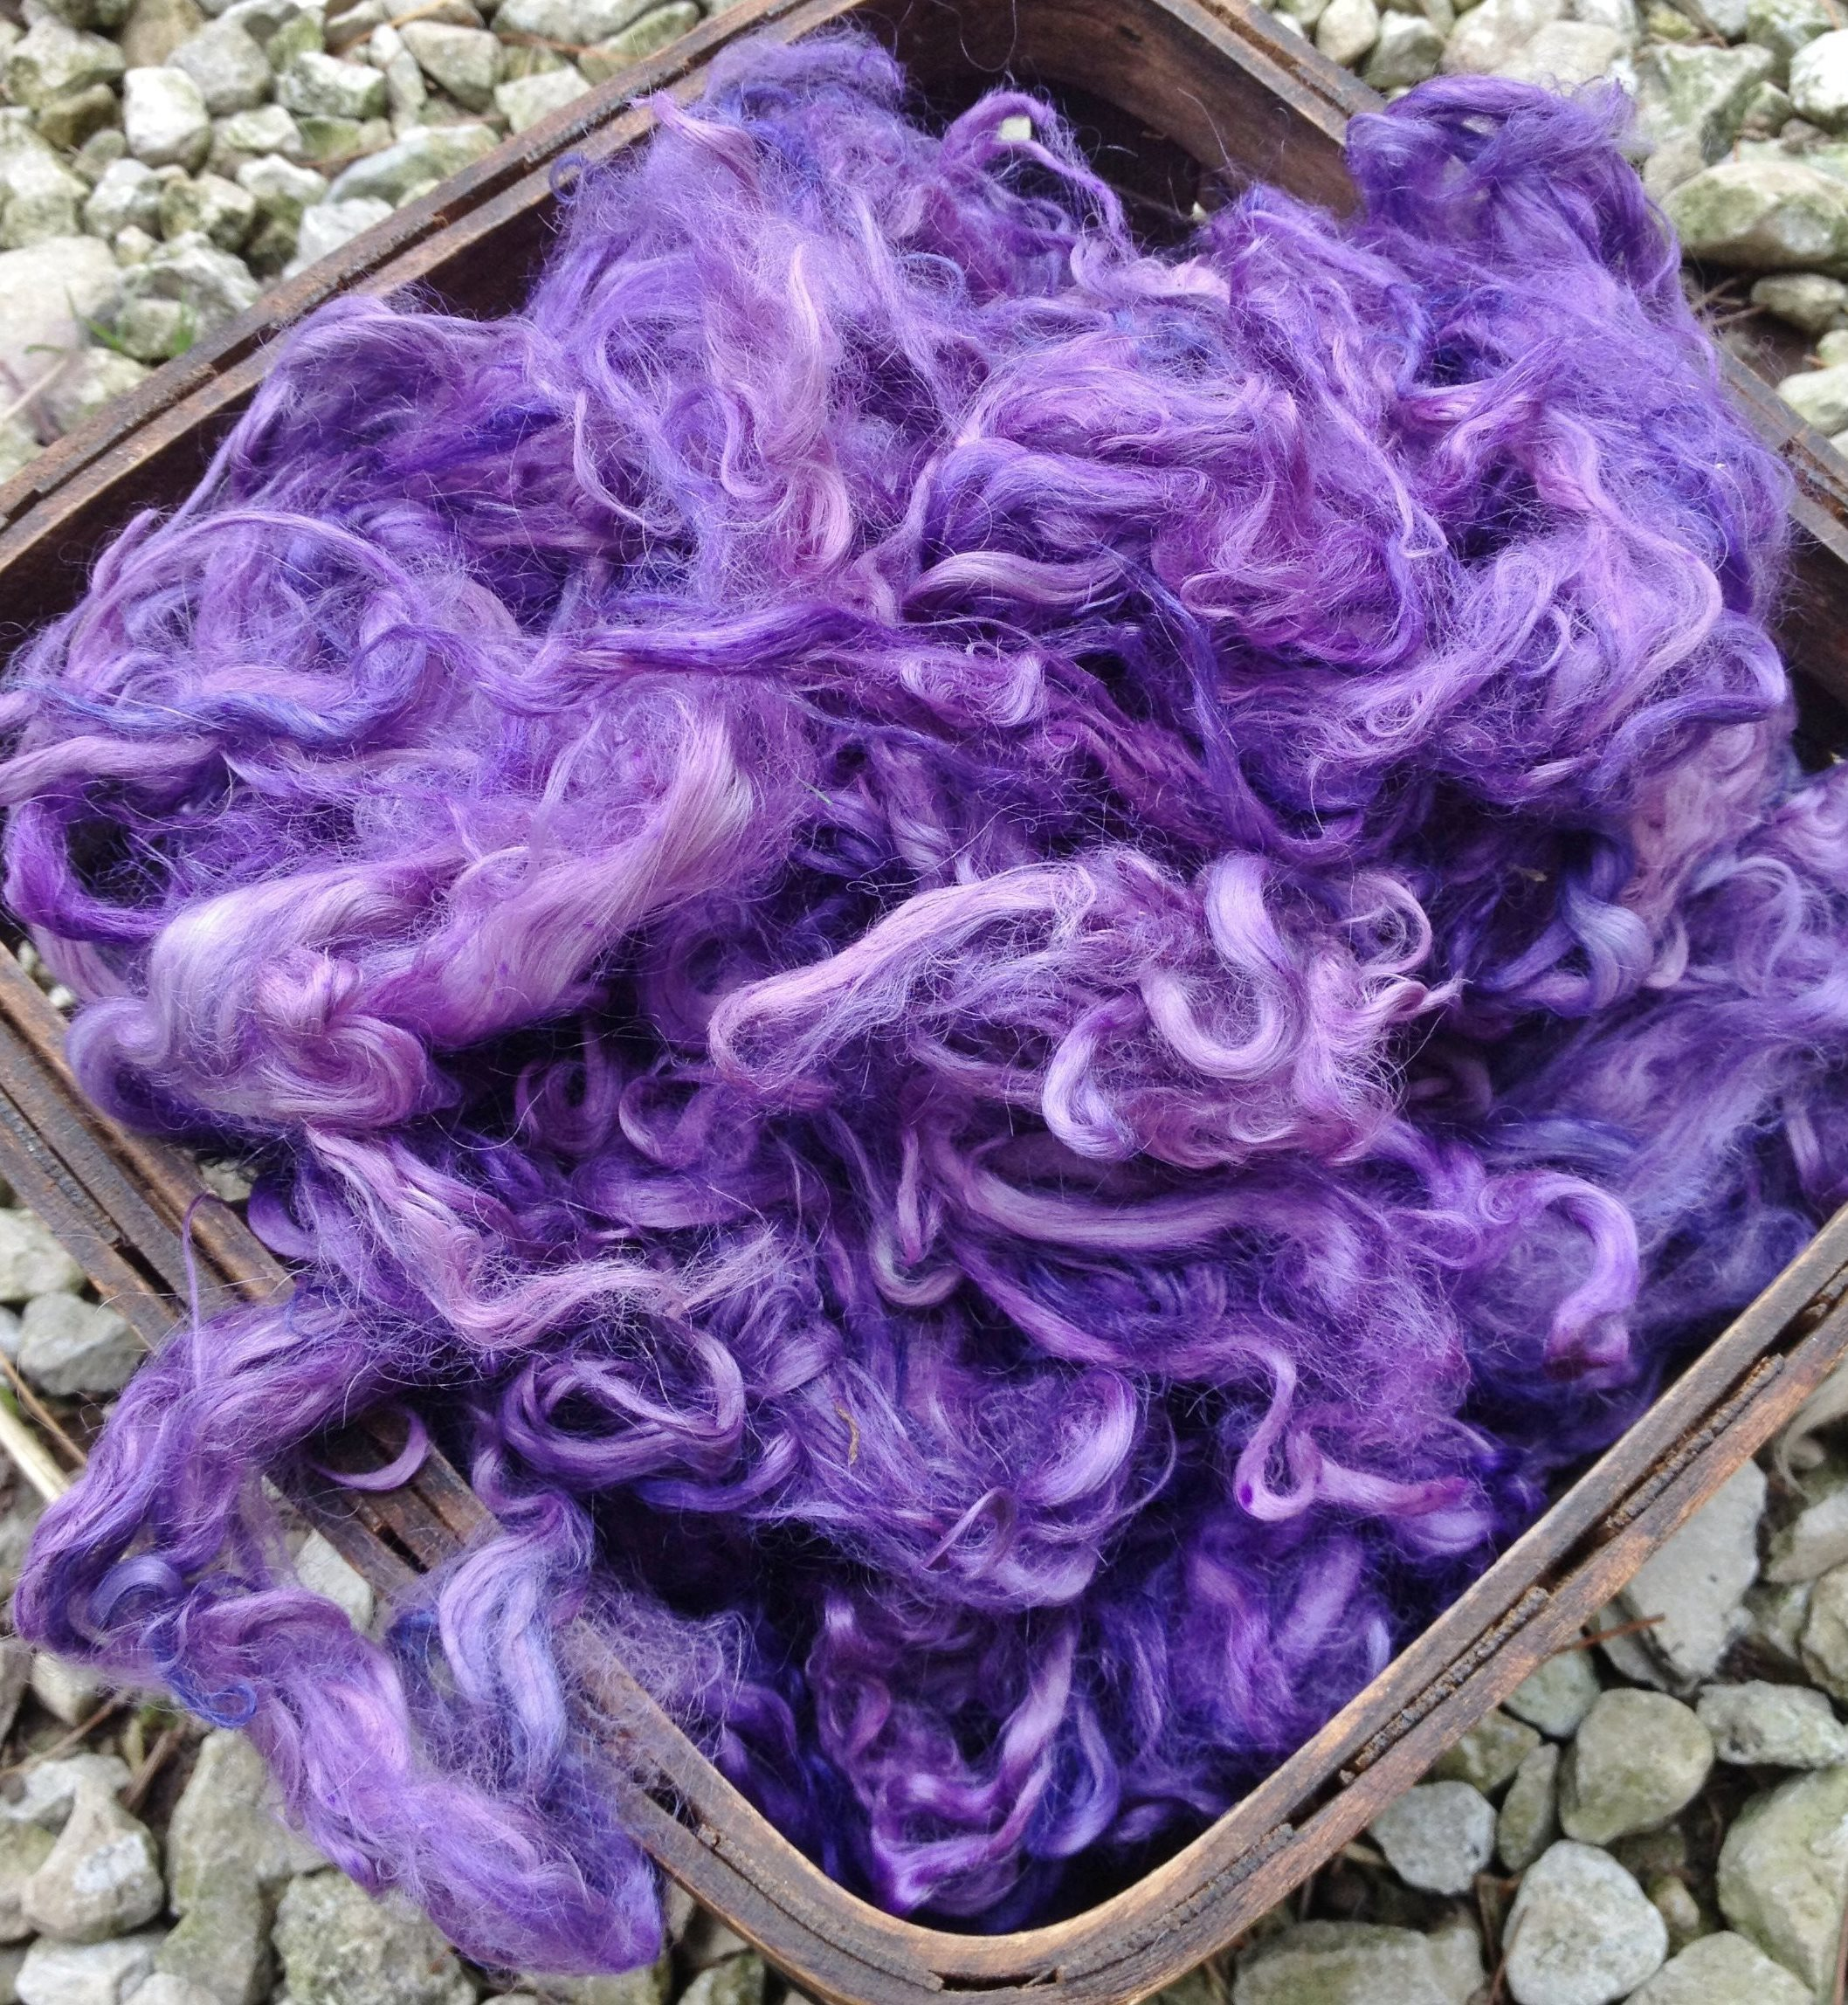 Hand-Dyed Suri Alpaca Fiber, 5 Inches, Mulberry 17761